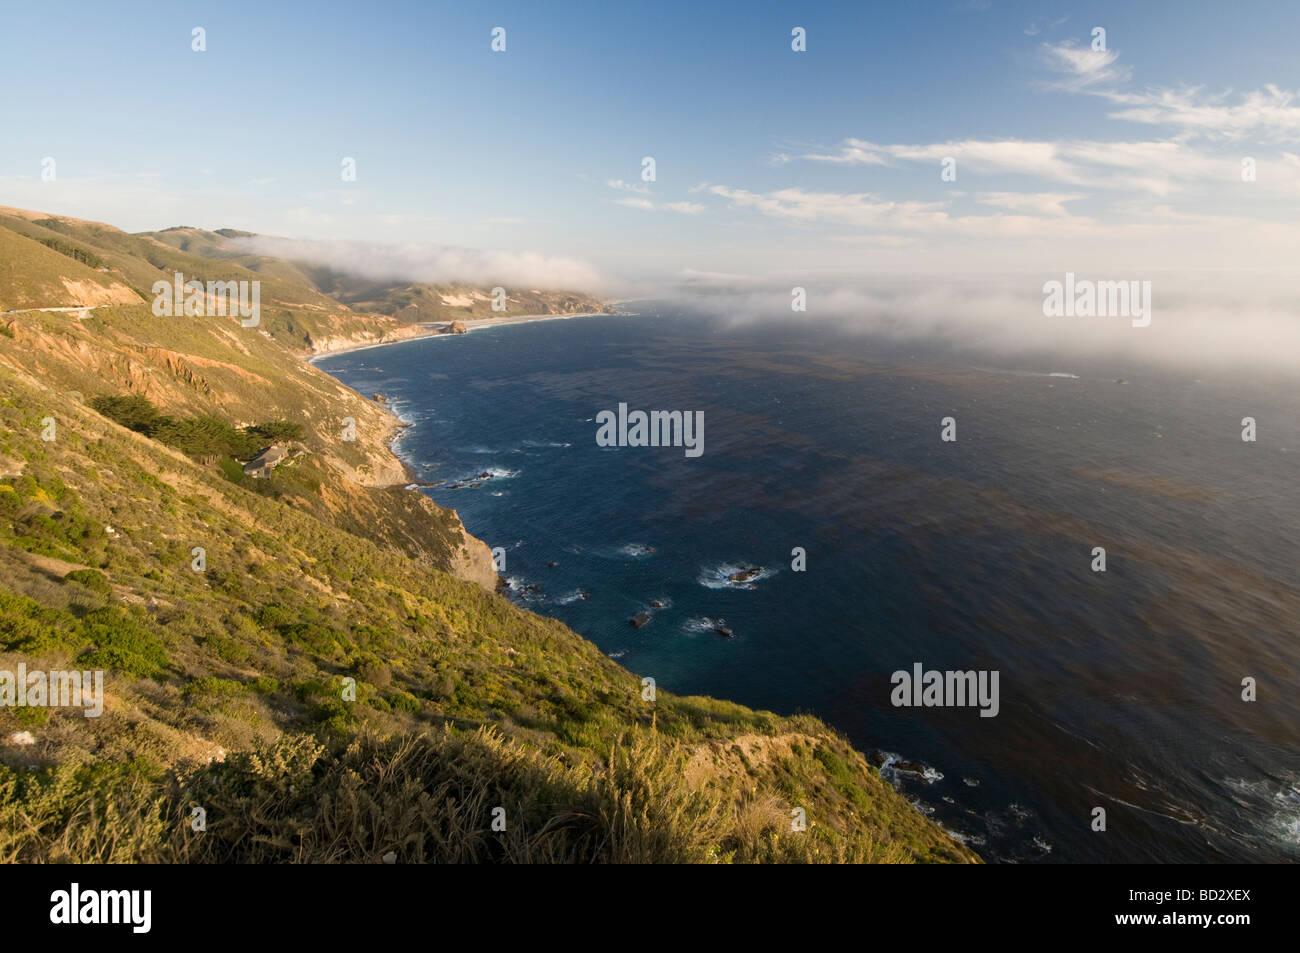 rocky coastal cliffs of Big Sur California - Stock Image